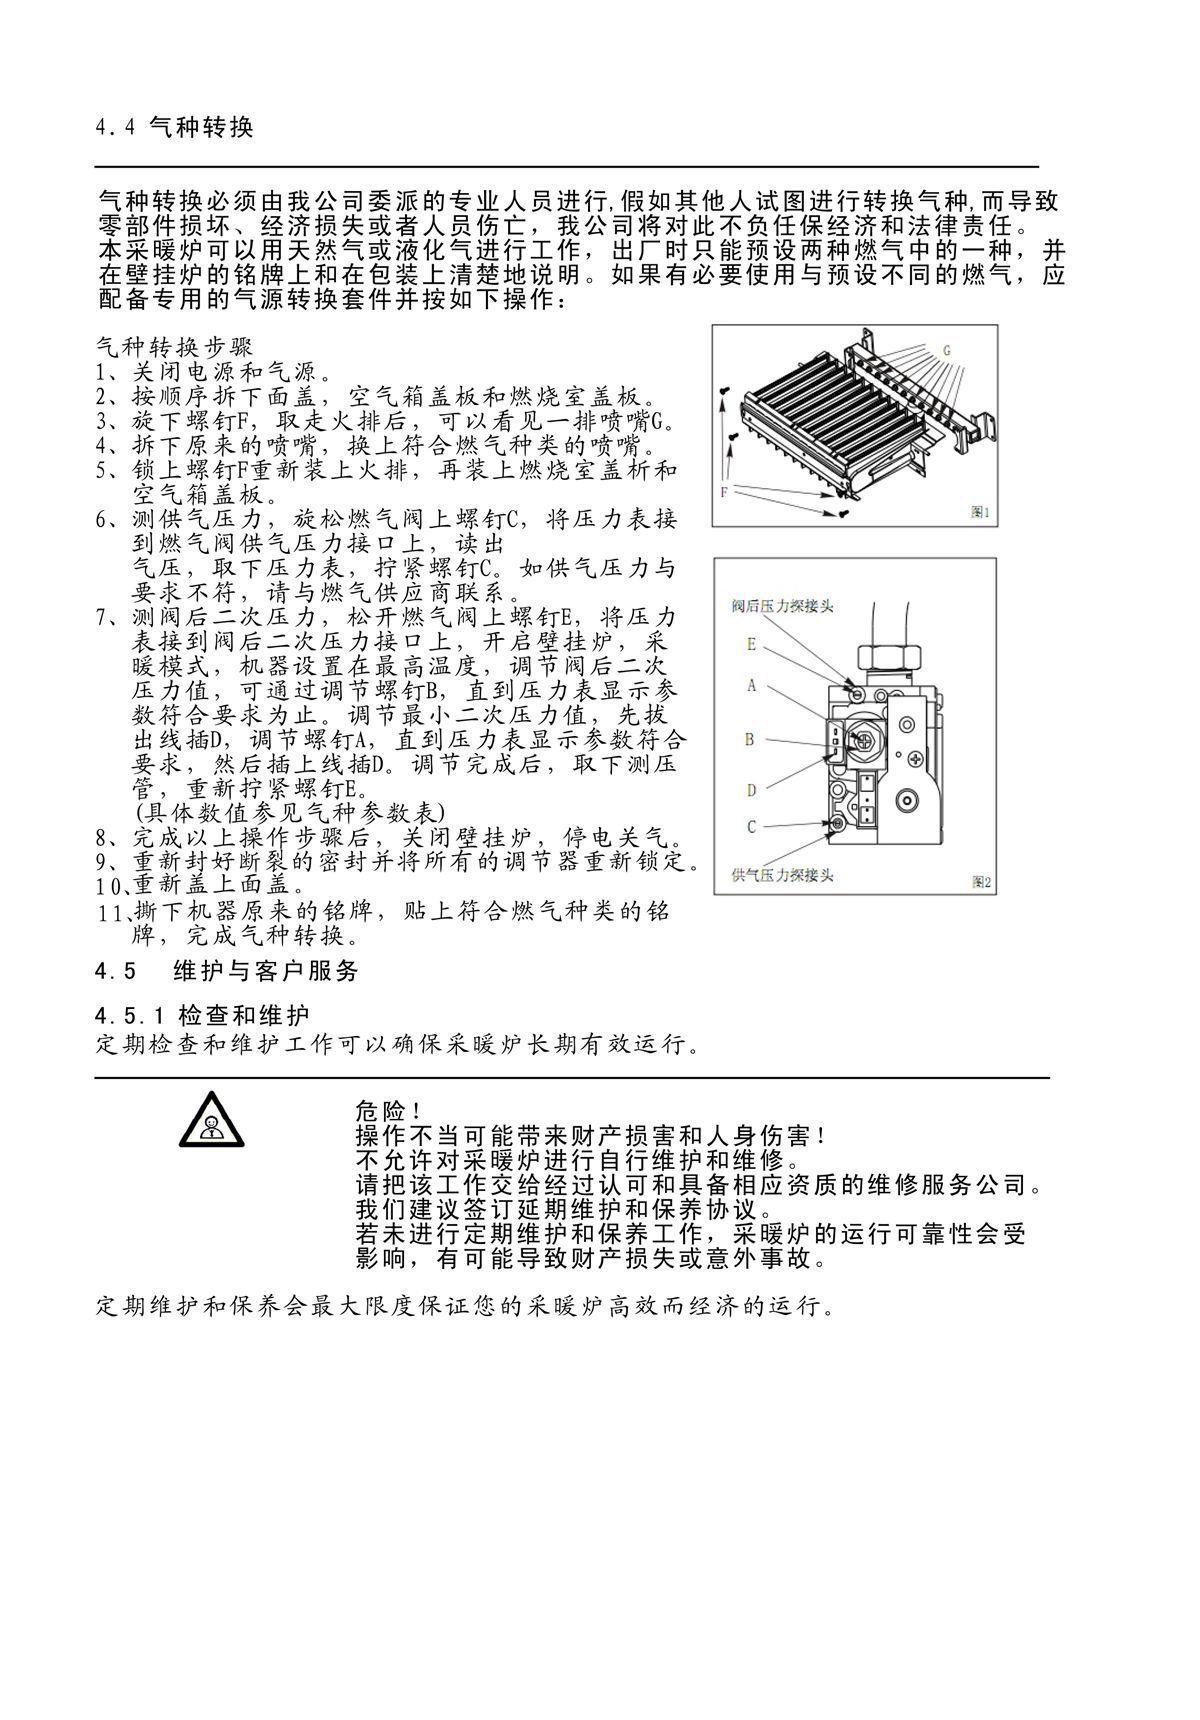 ES01系列-用户使用手册-7_02.jpg